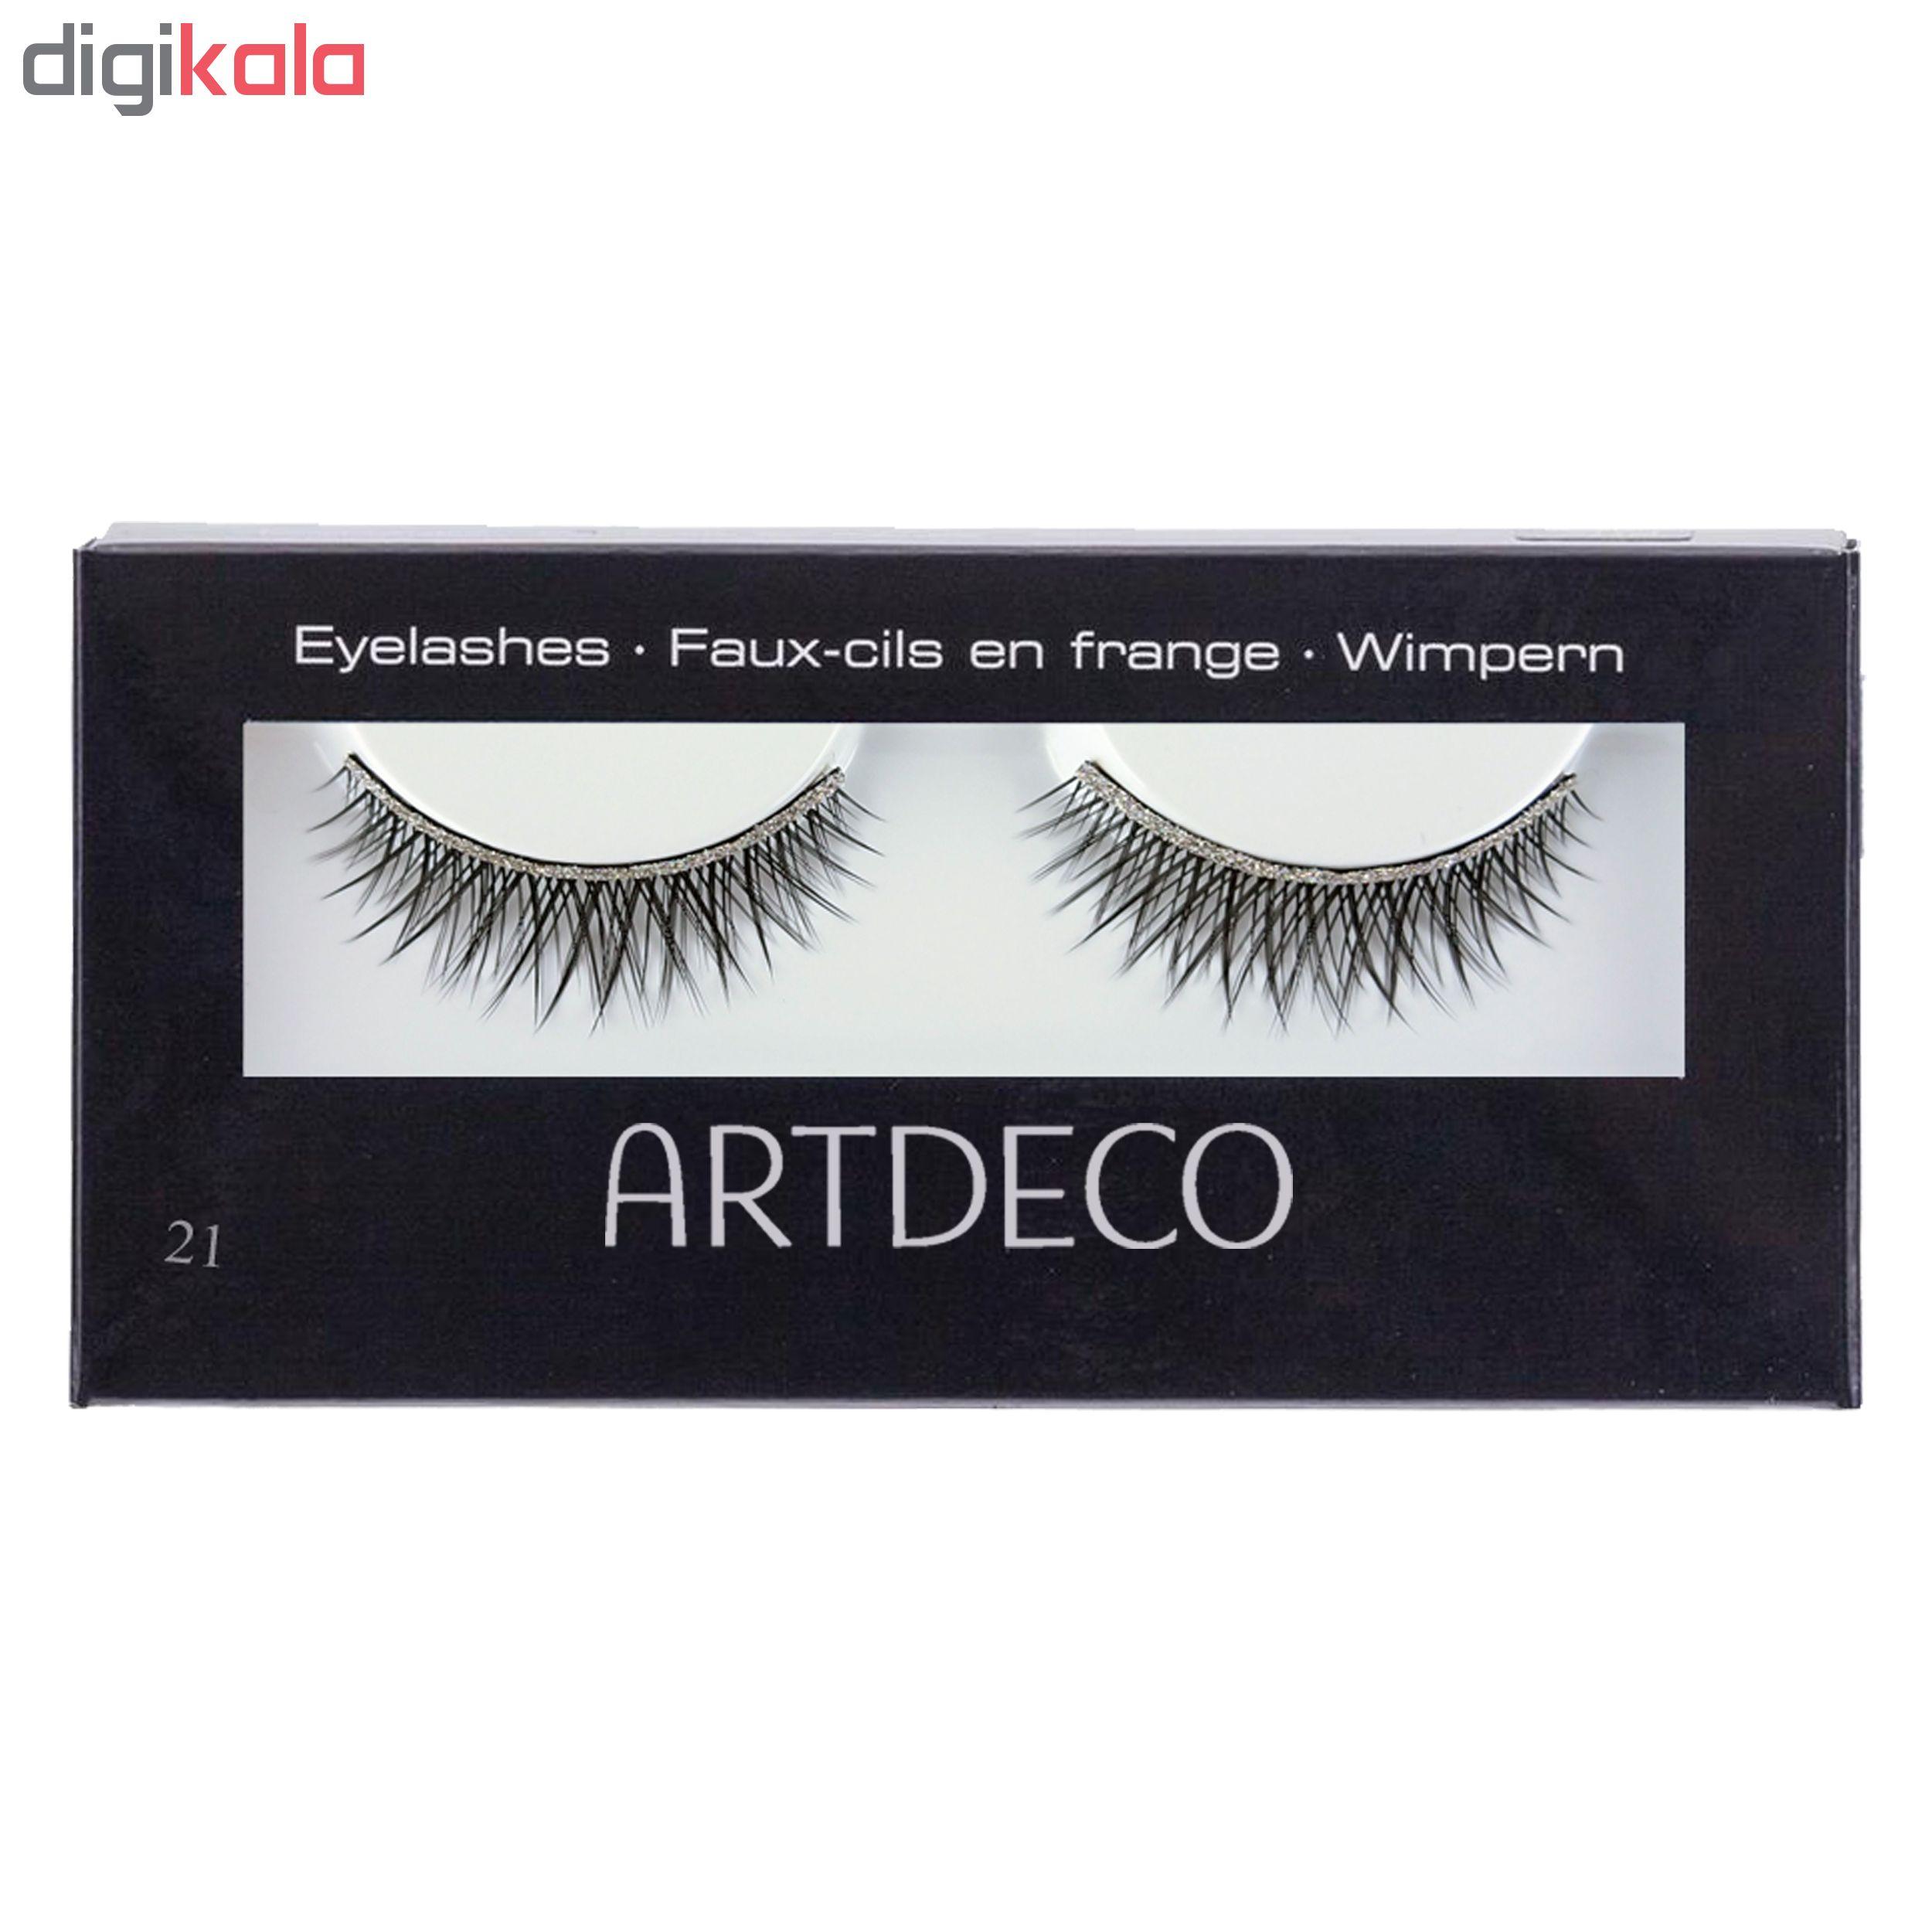 مژه مصنوعی آرت دکو مدل Glamour Eyelashes شماره 21